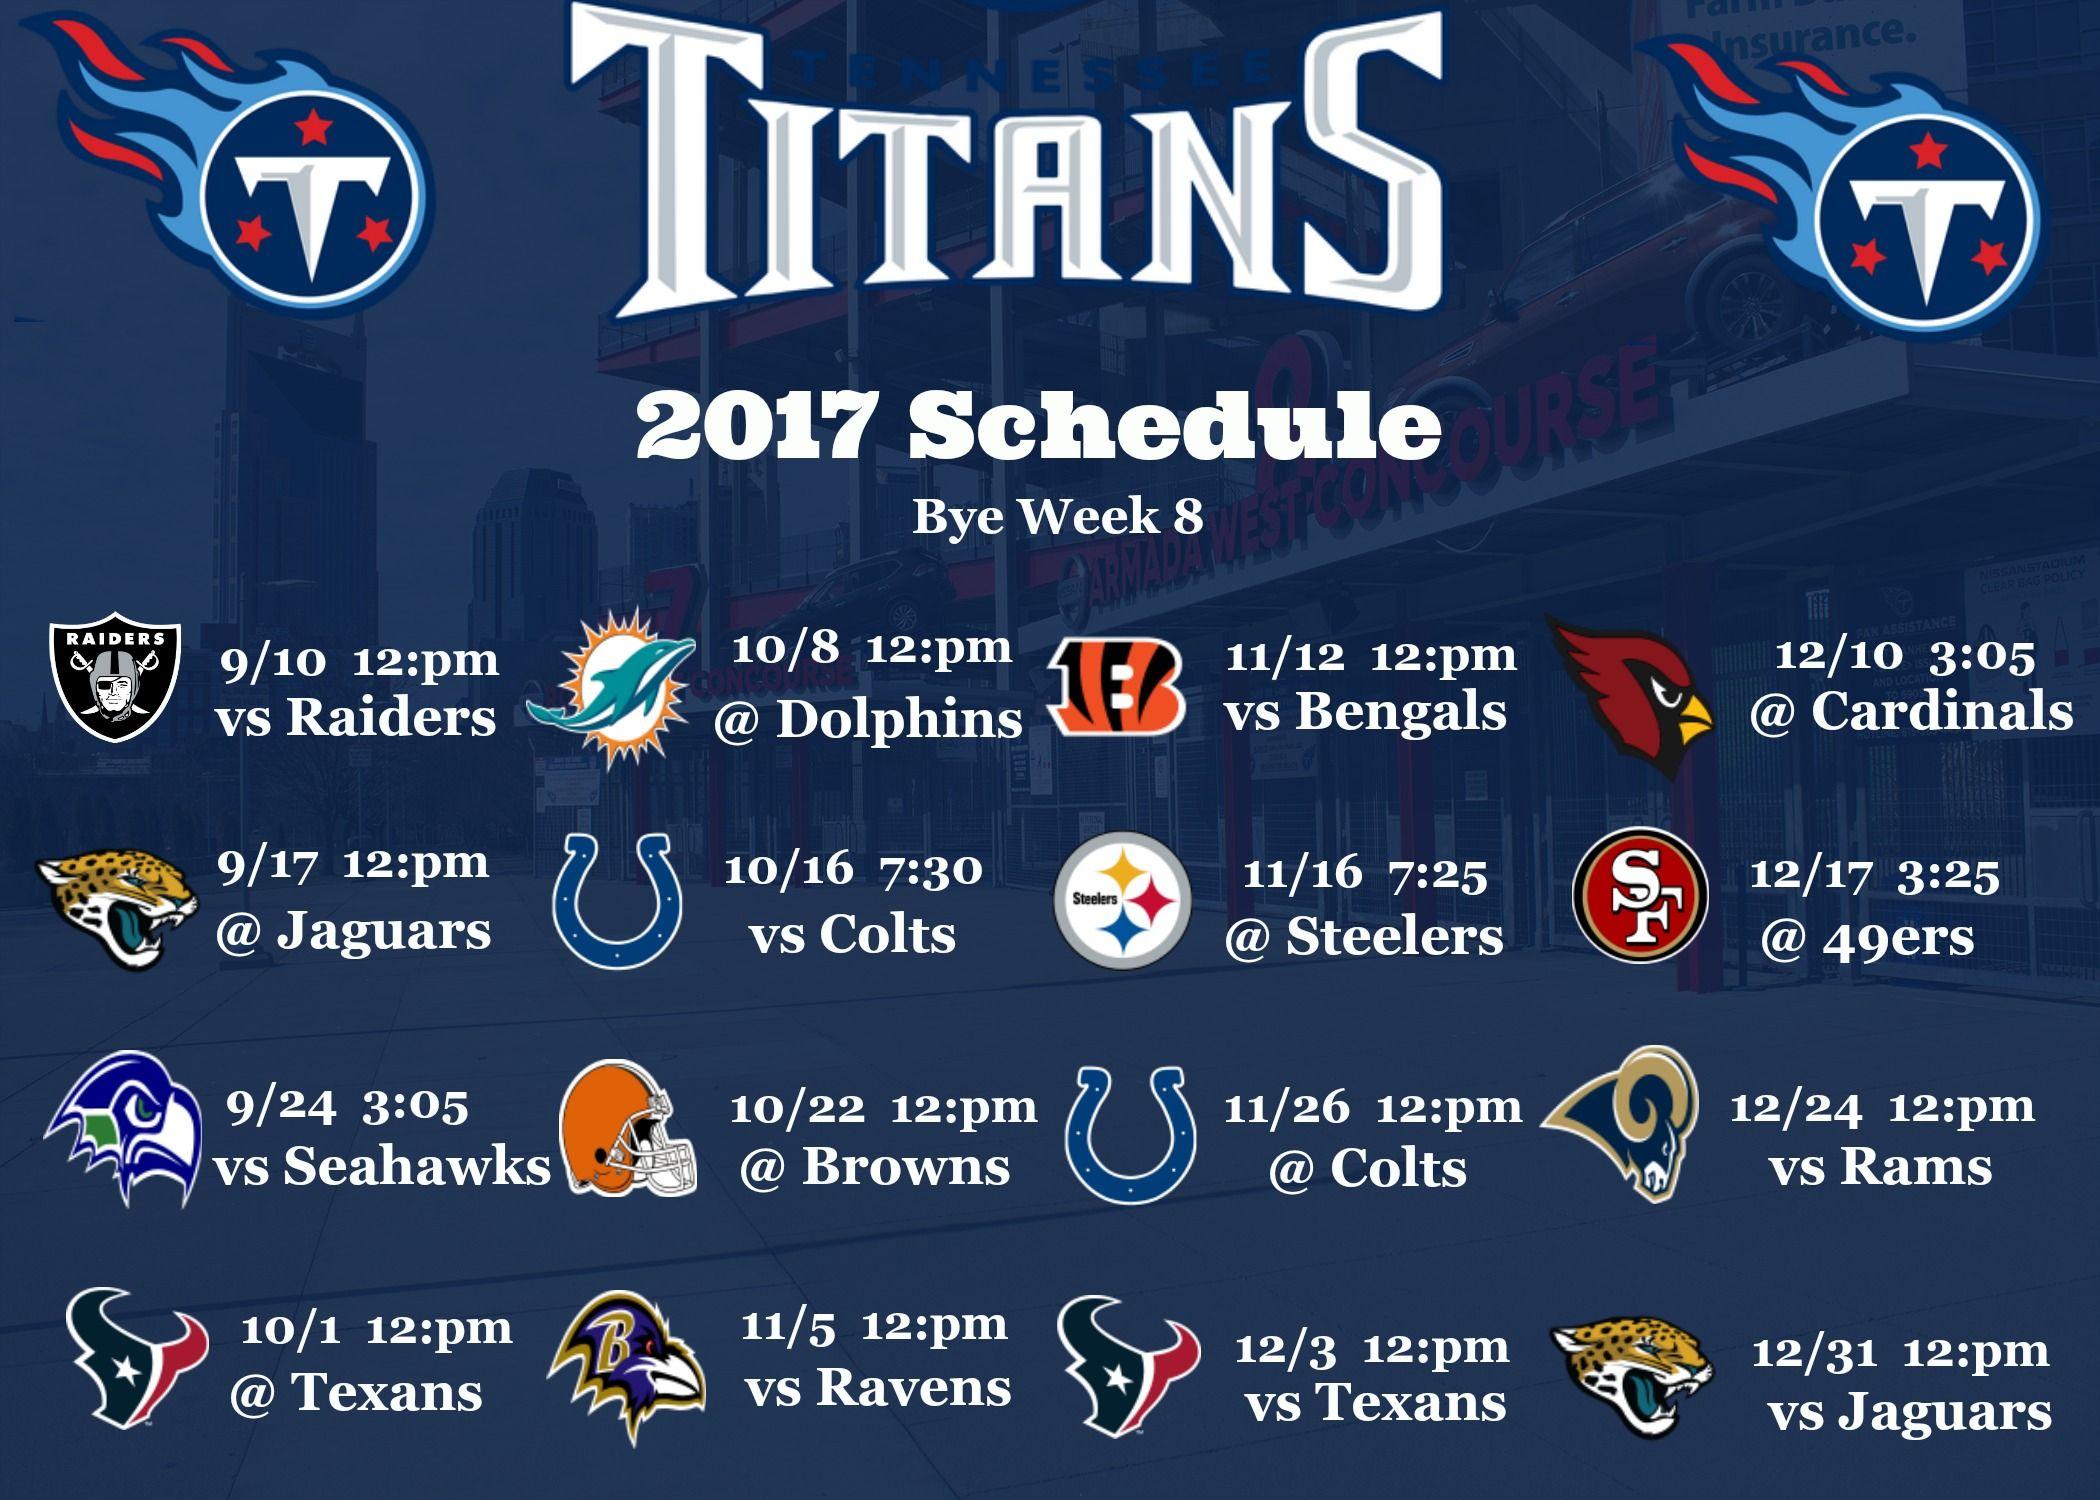 Tennessee Titans 2017 Schedule Wallpaper Download Http Www Nashvillesportsnews Com Football Ten Titans Football Tennessee Titans Football Nfl Football Season